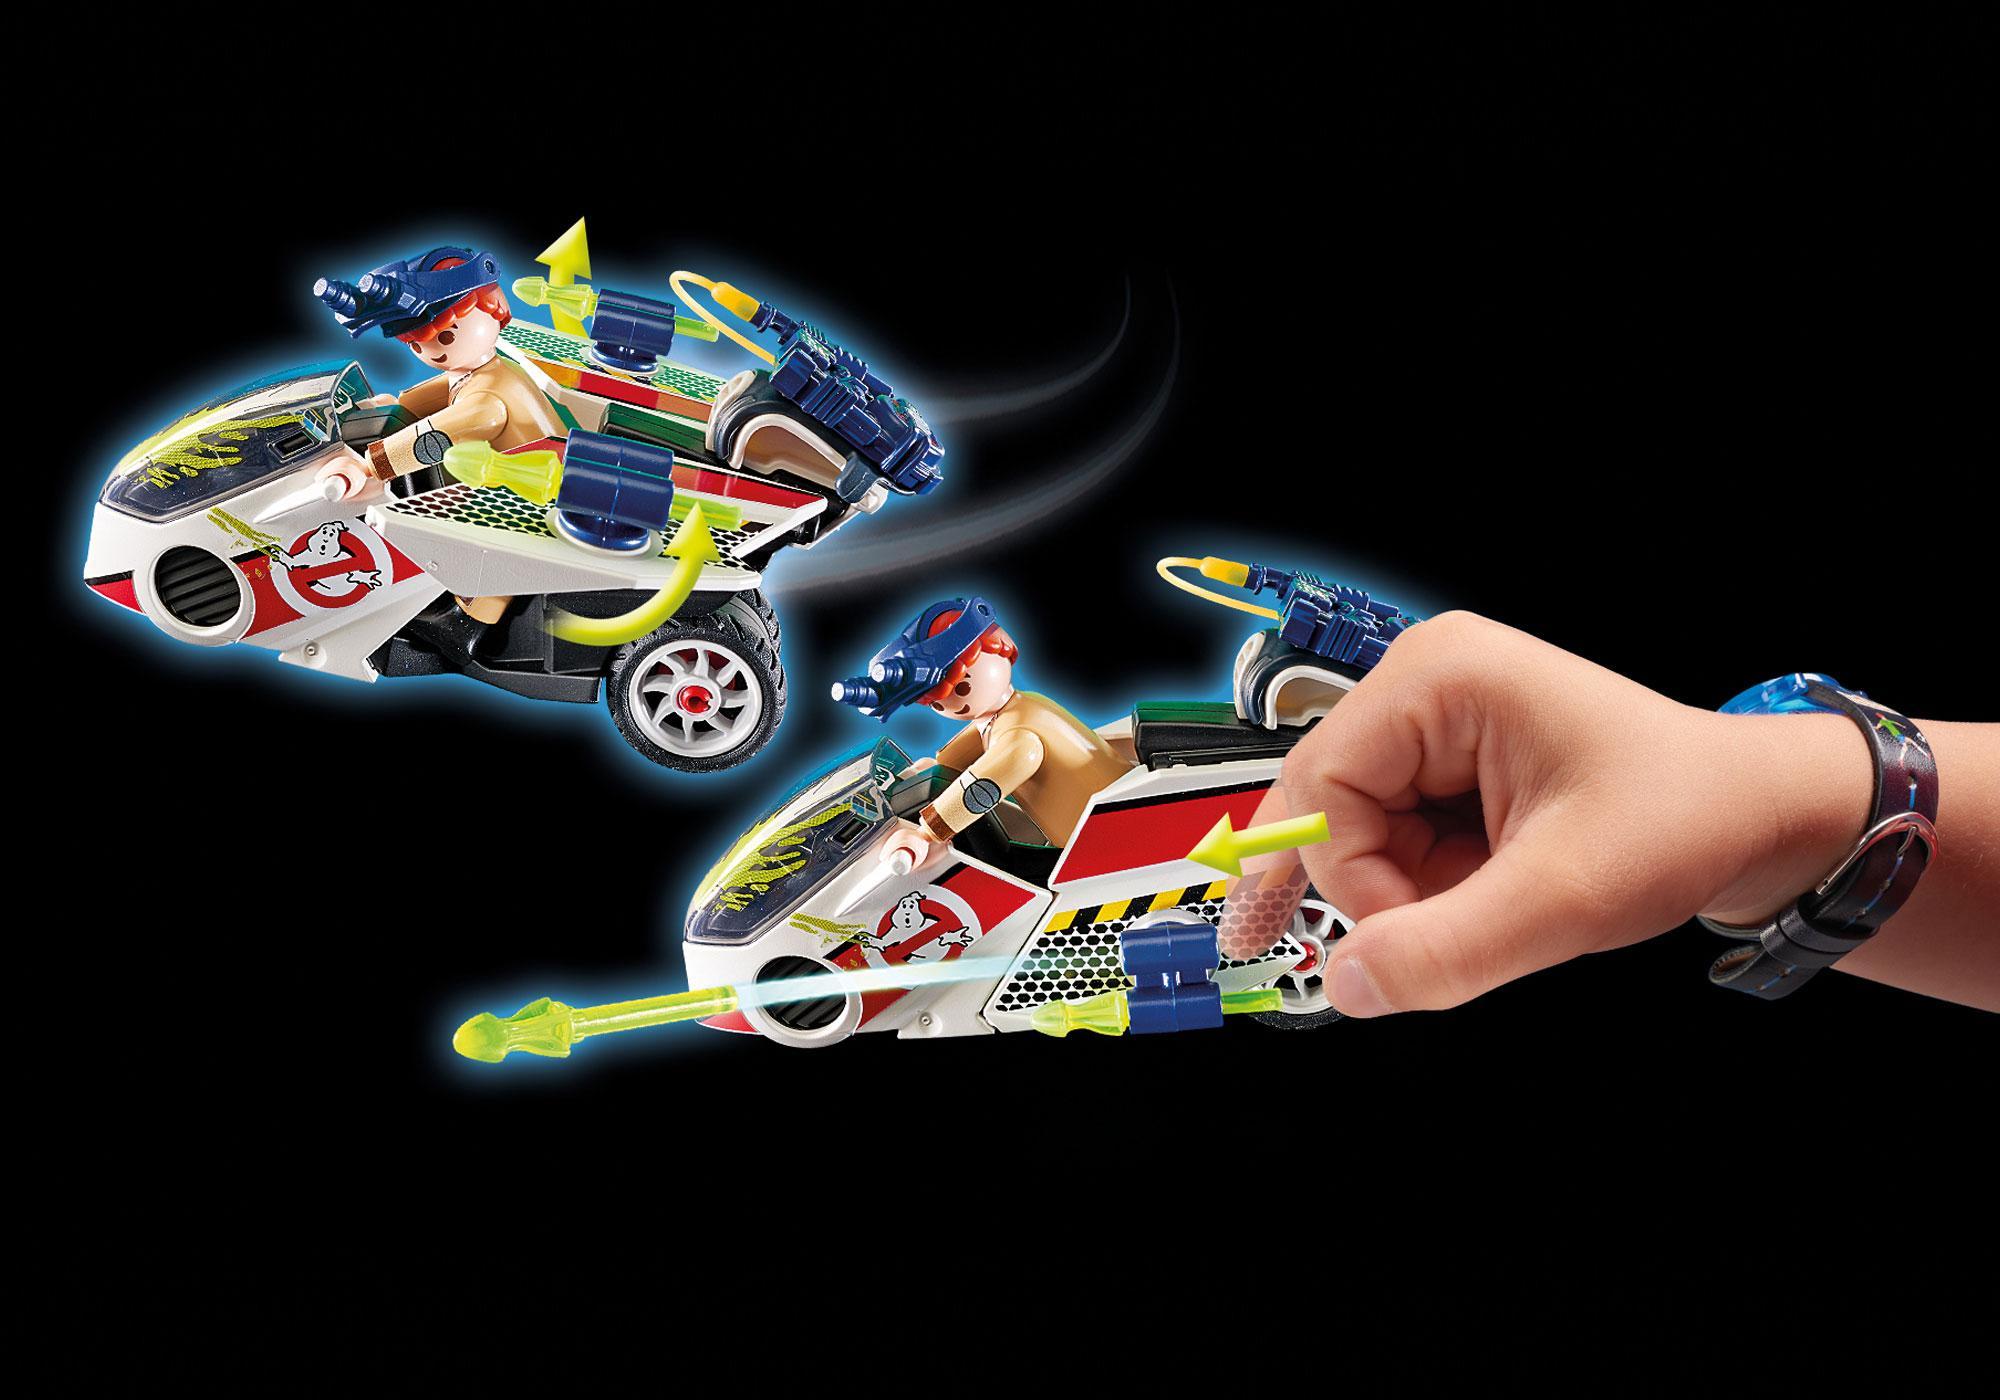 http://media.playmobil.com/i/playmobil/9388_product_extra1/Stanz met luchtmoto